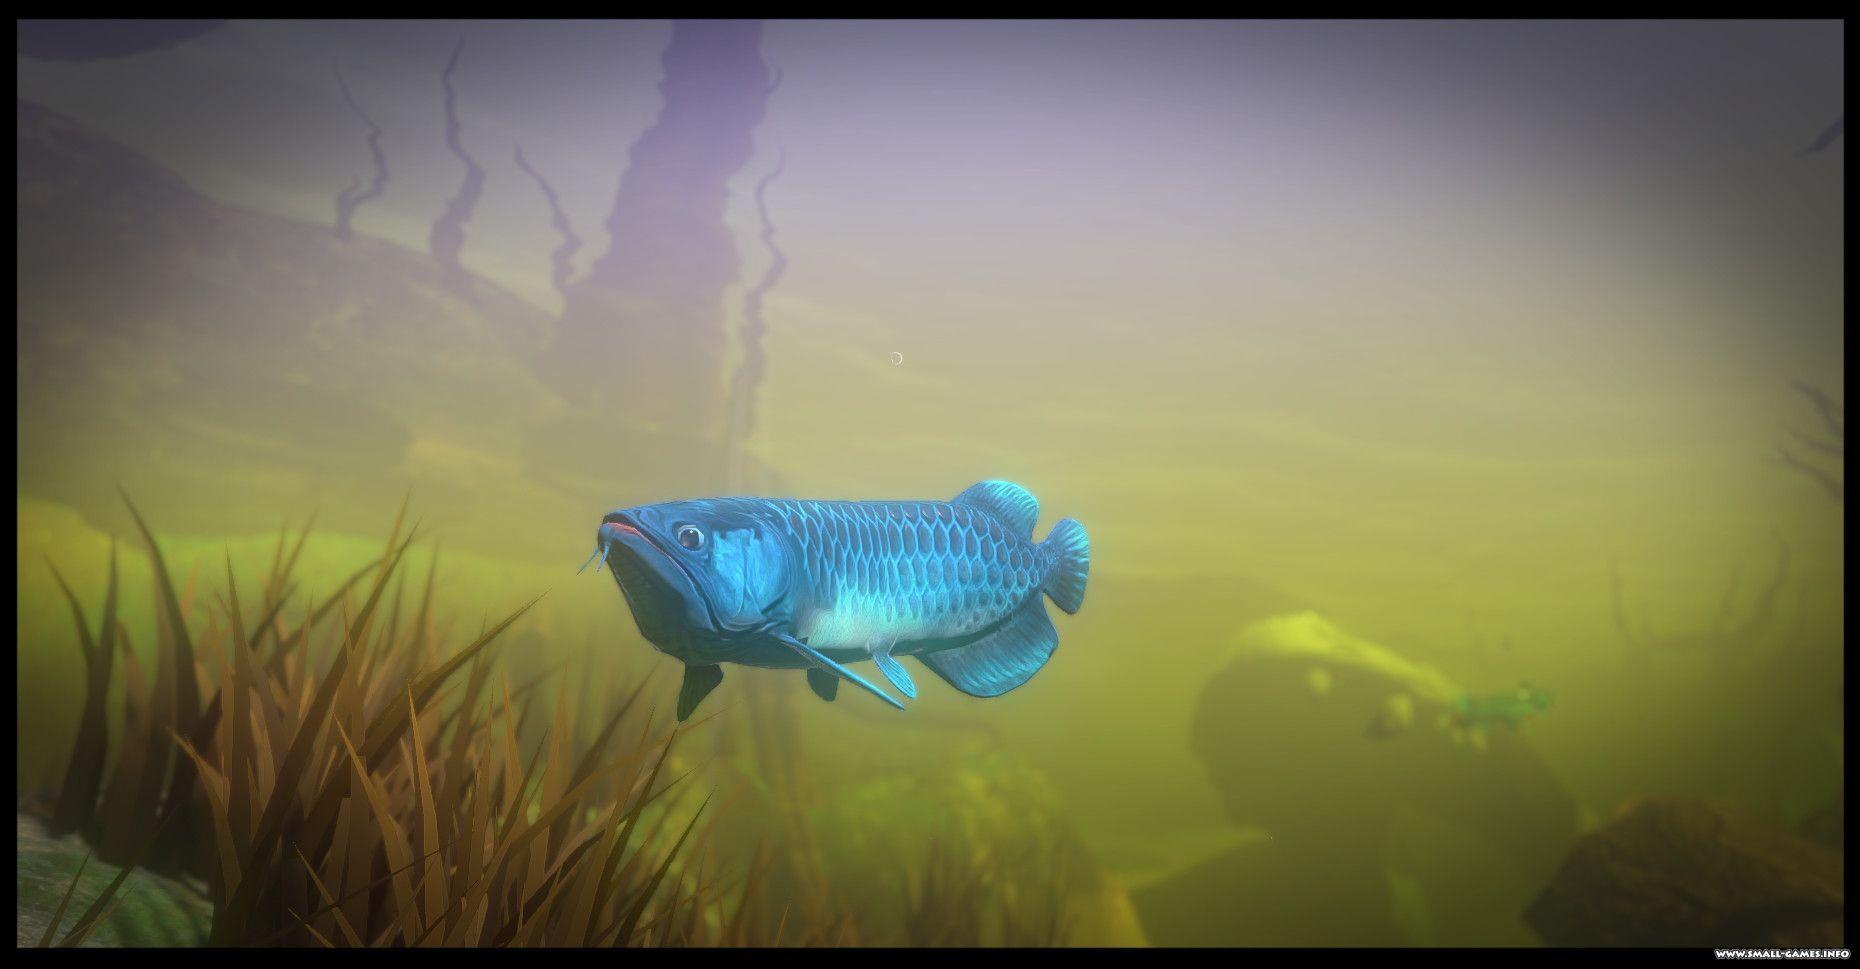 Feed and grow fish v0. 8. 5 free download! Скачать бесплатно! Crub.